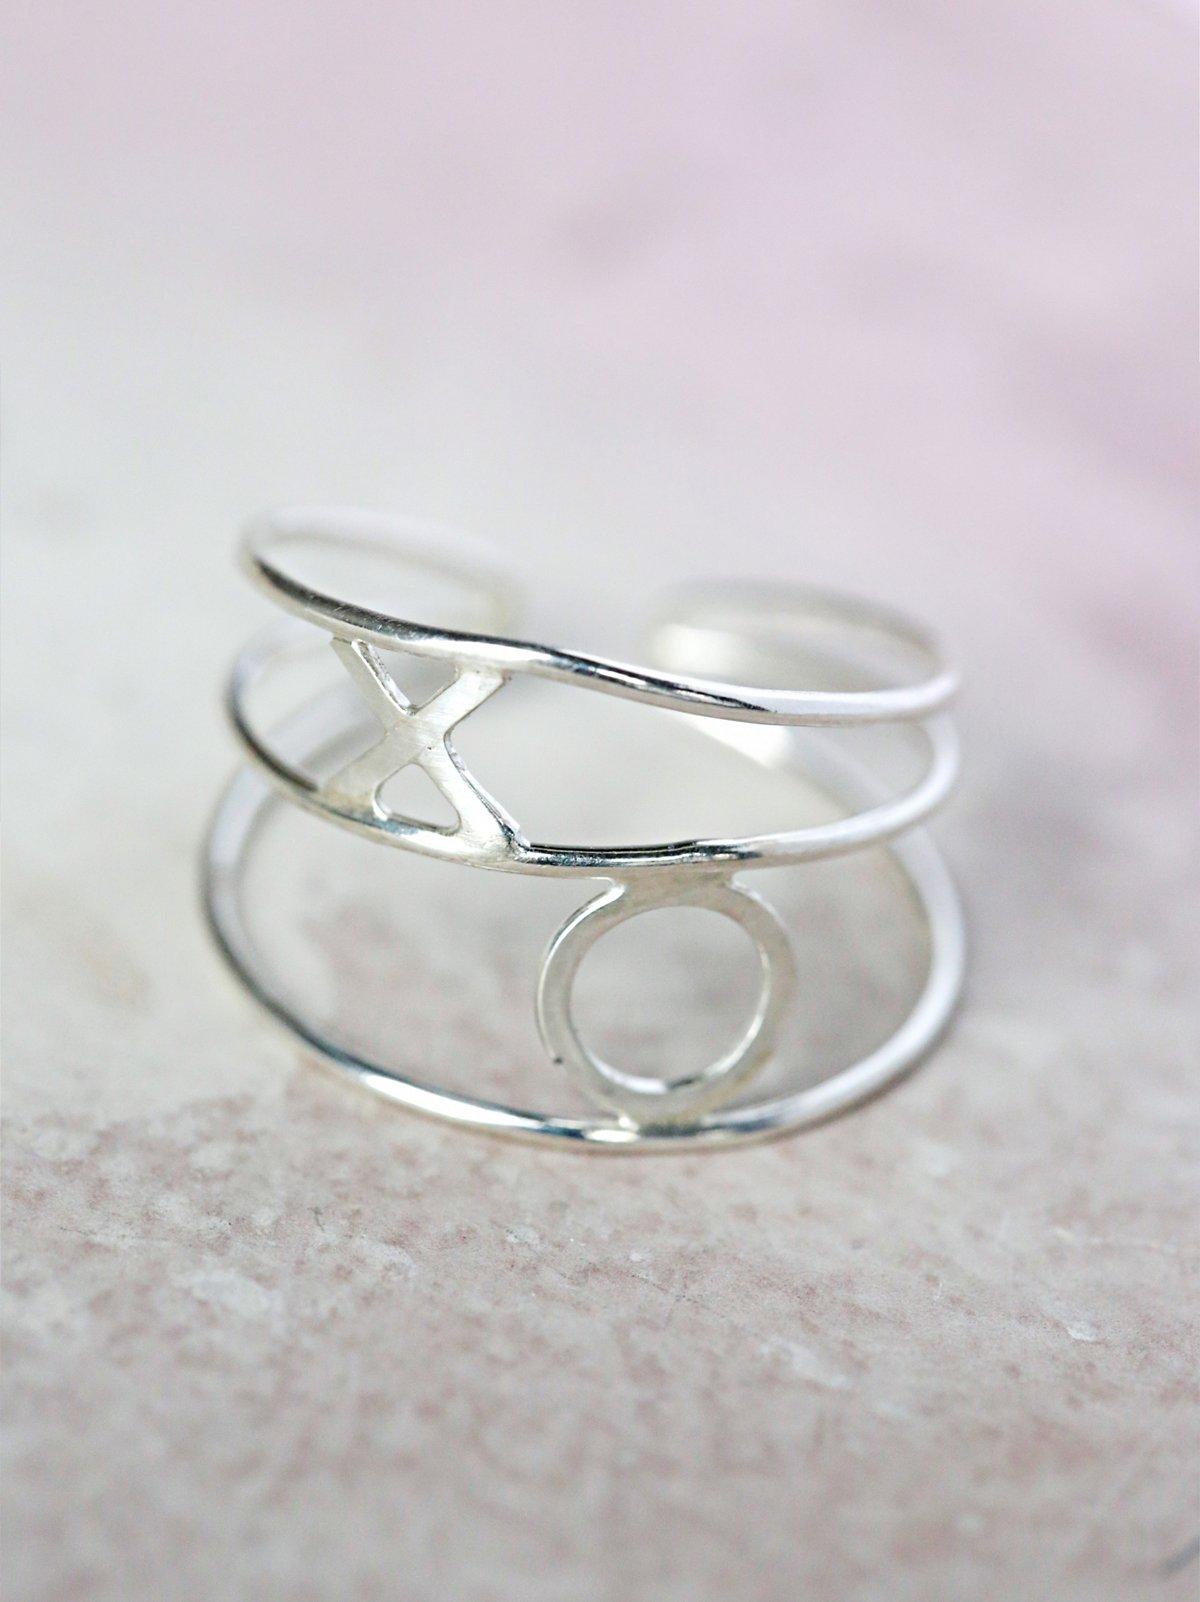 Xo缠绕式戒指